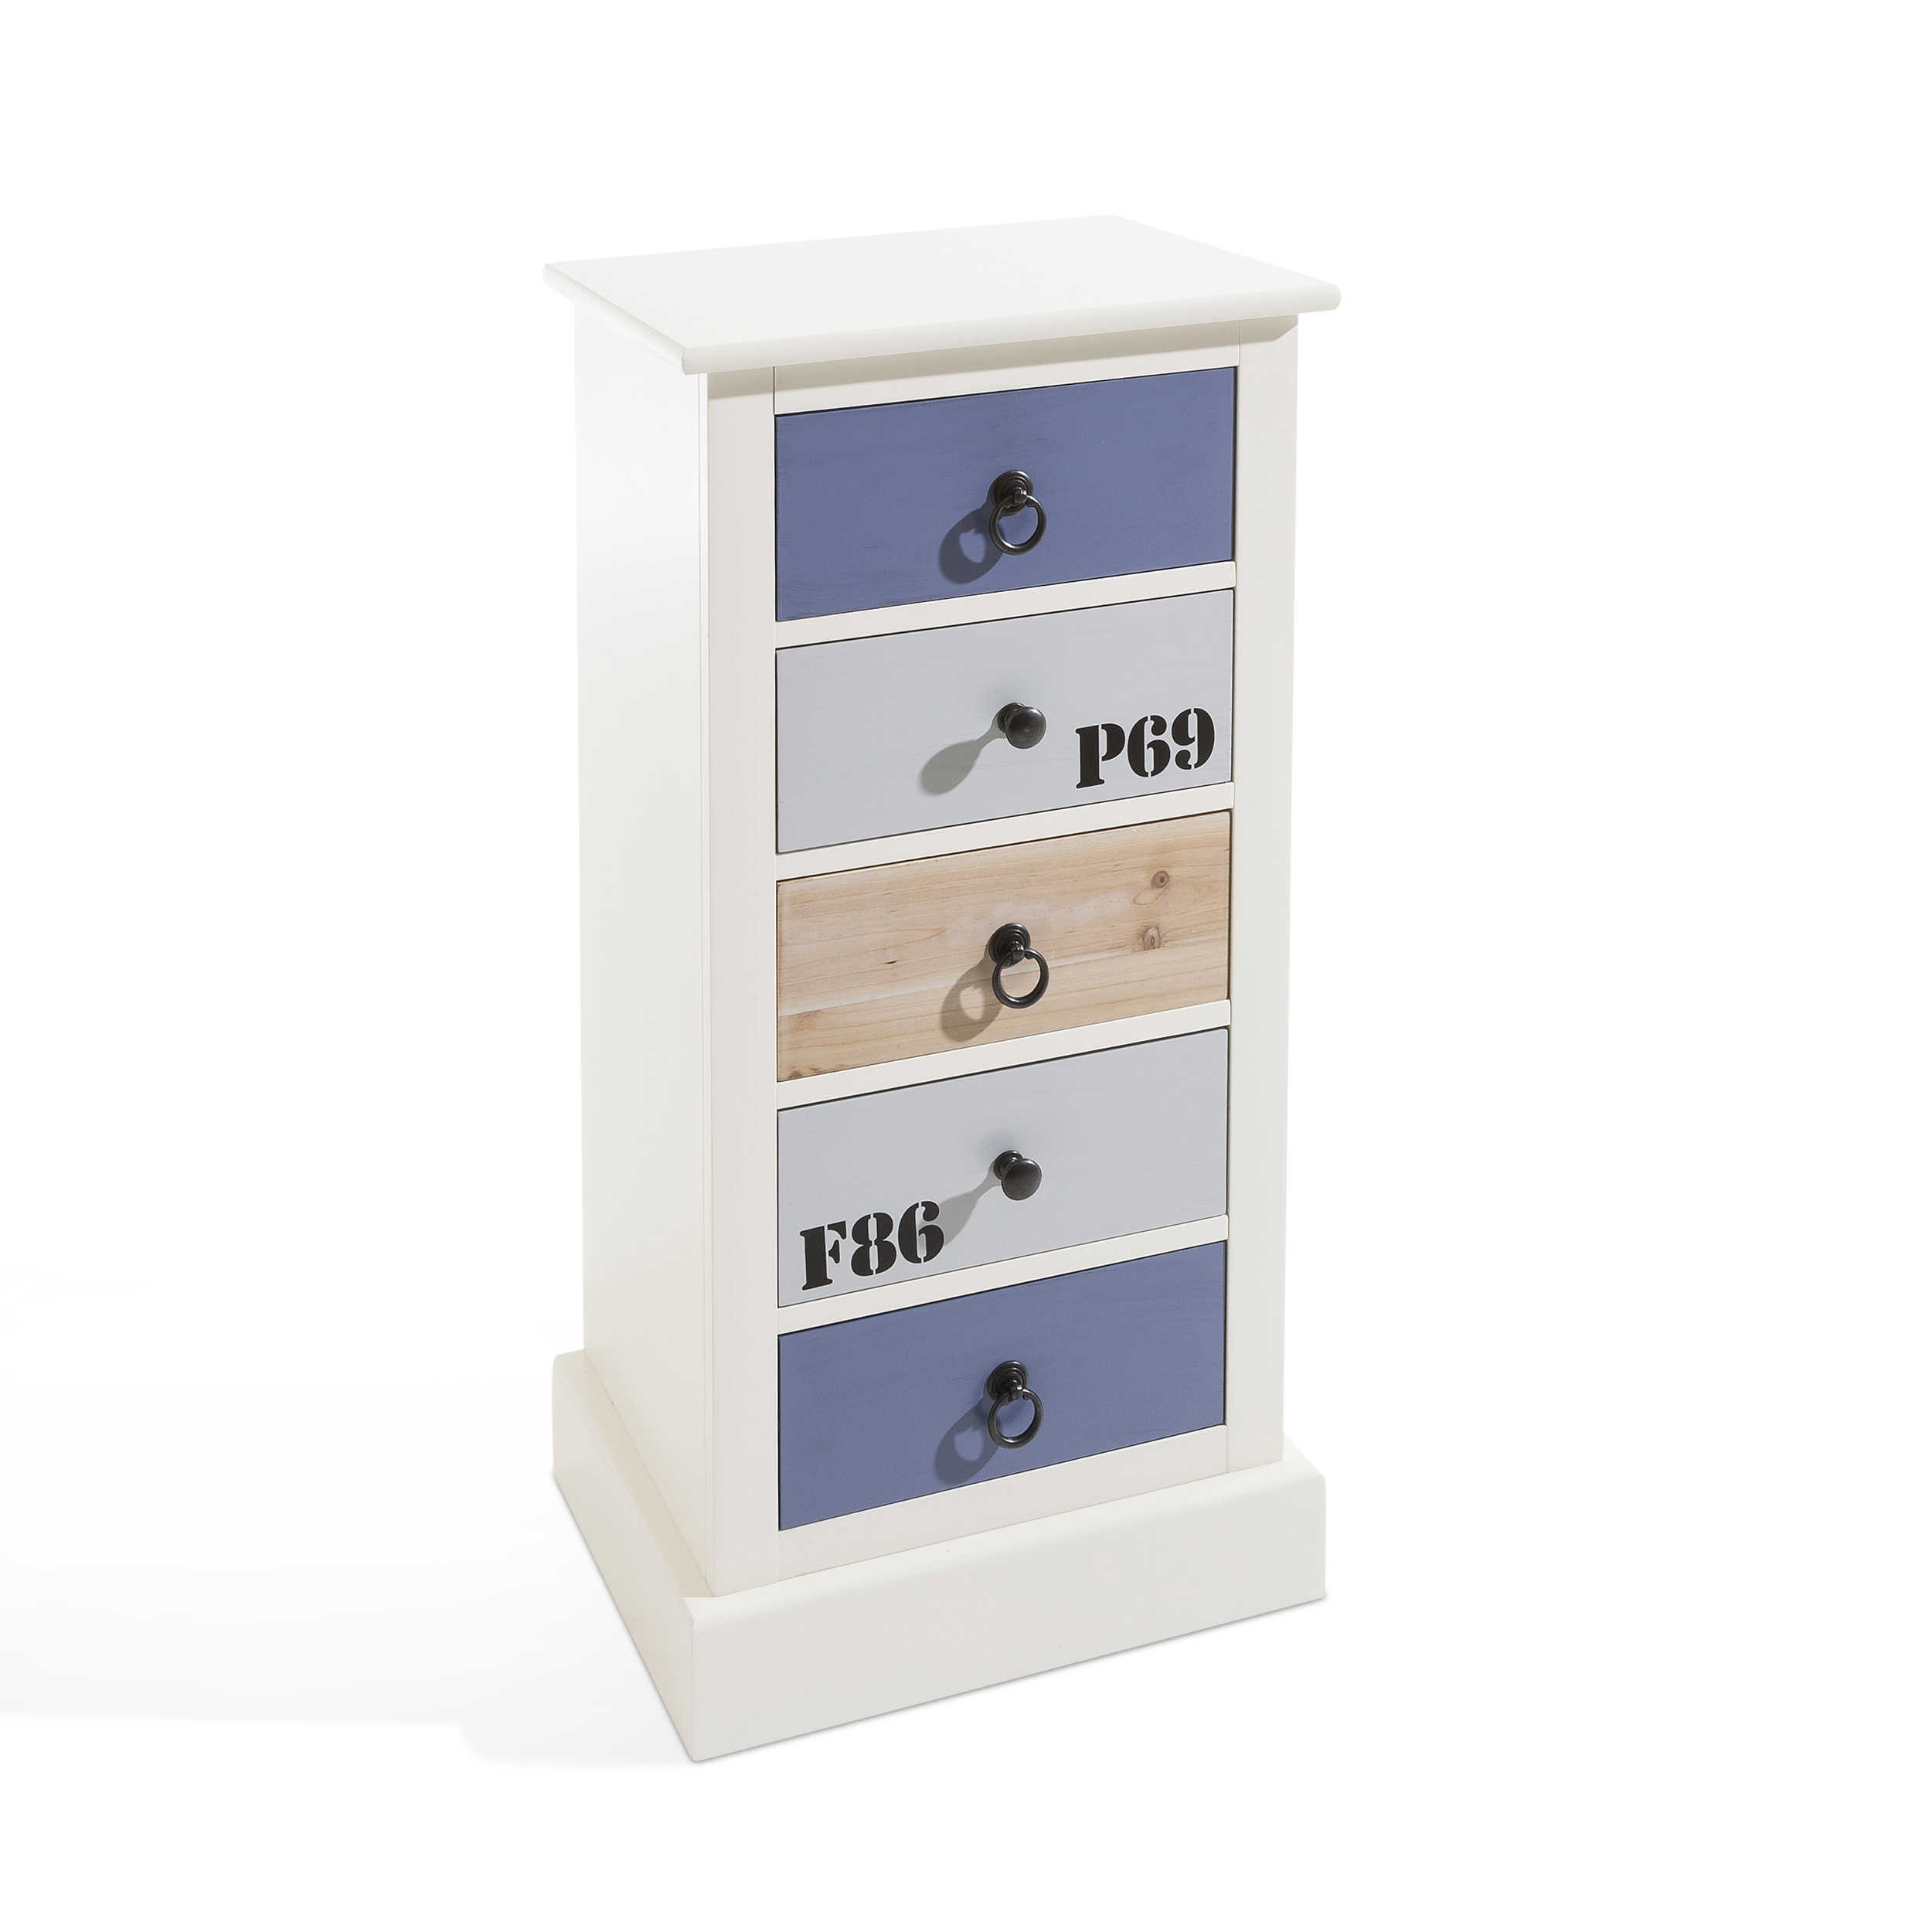 fmd kommode polino bunt holzoptik online kaufen bei woonio. Black Bedroom Furniture Sets. Home Design Ideas